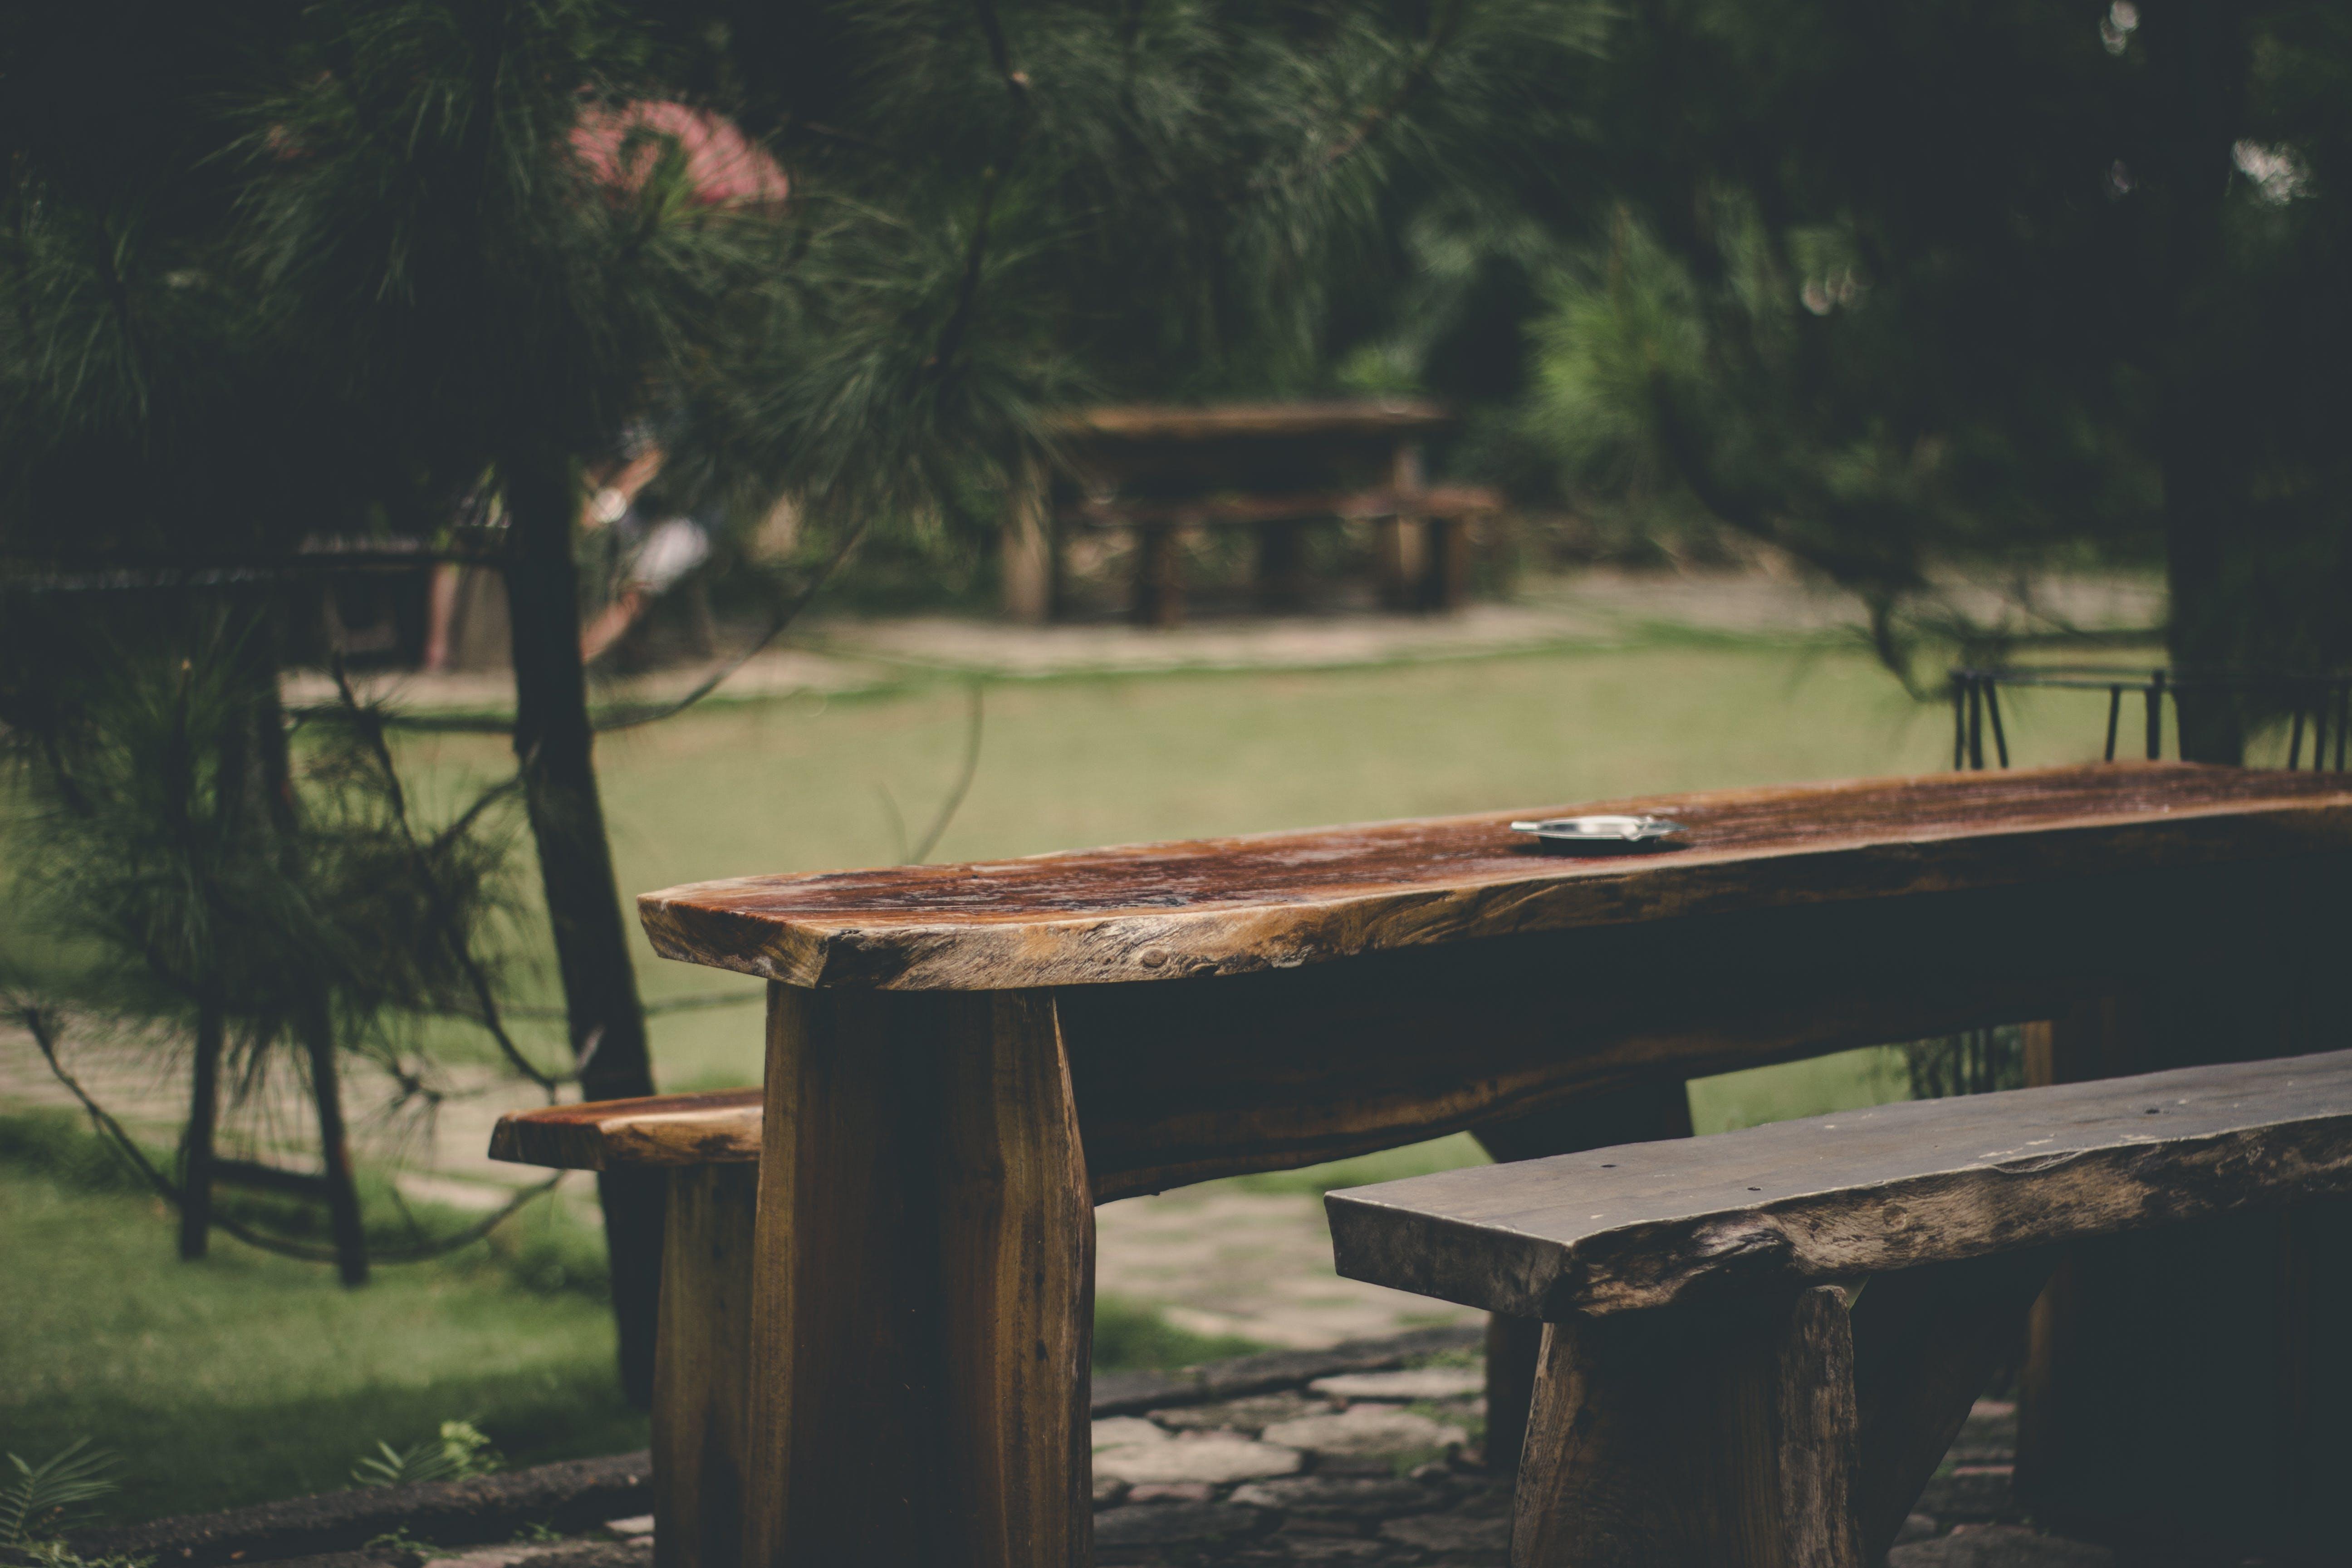 Gray Ashtray on Brown Wood Slab Table